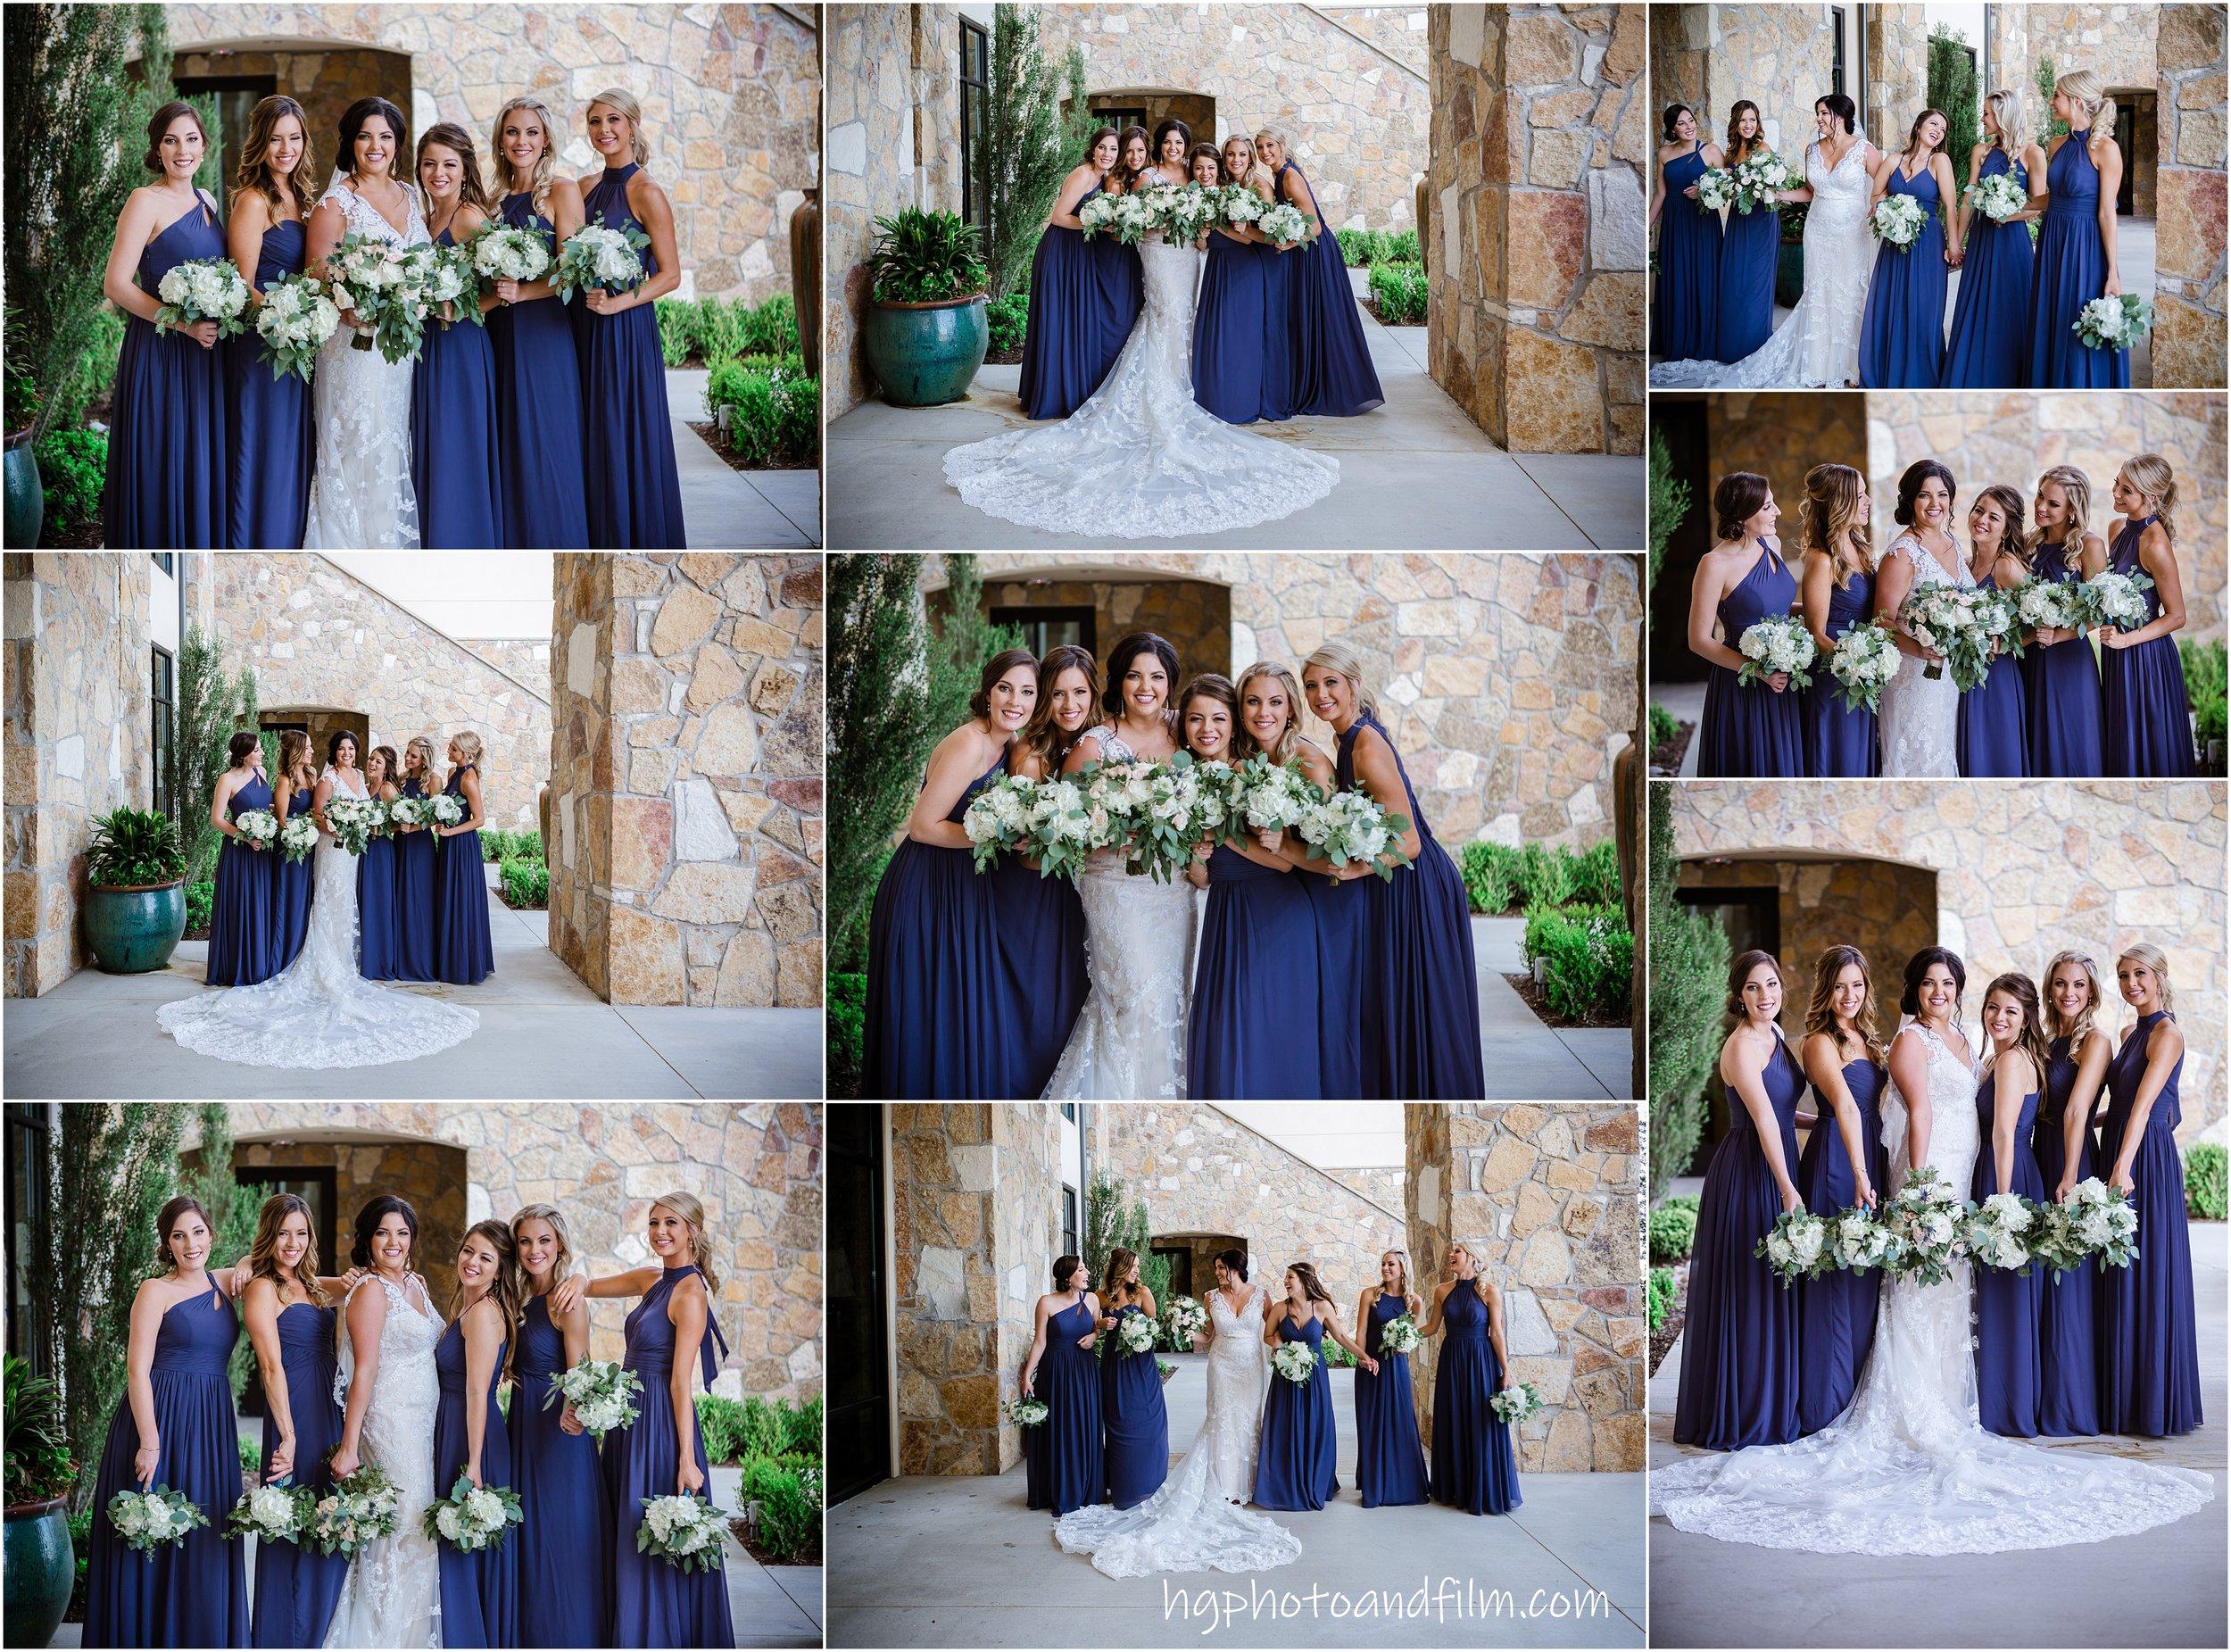 Those bridesmaids!